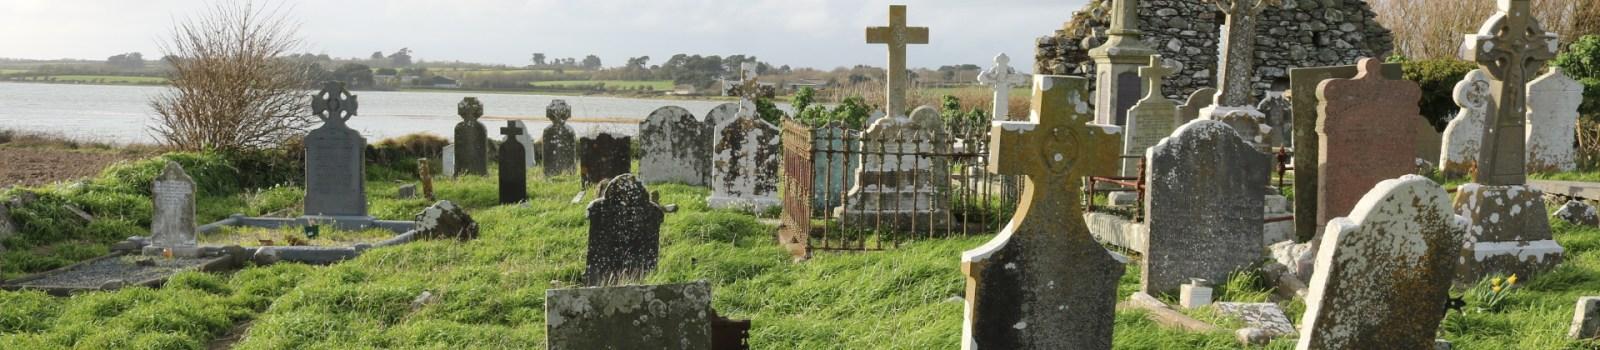 Lady's Island Cemetery